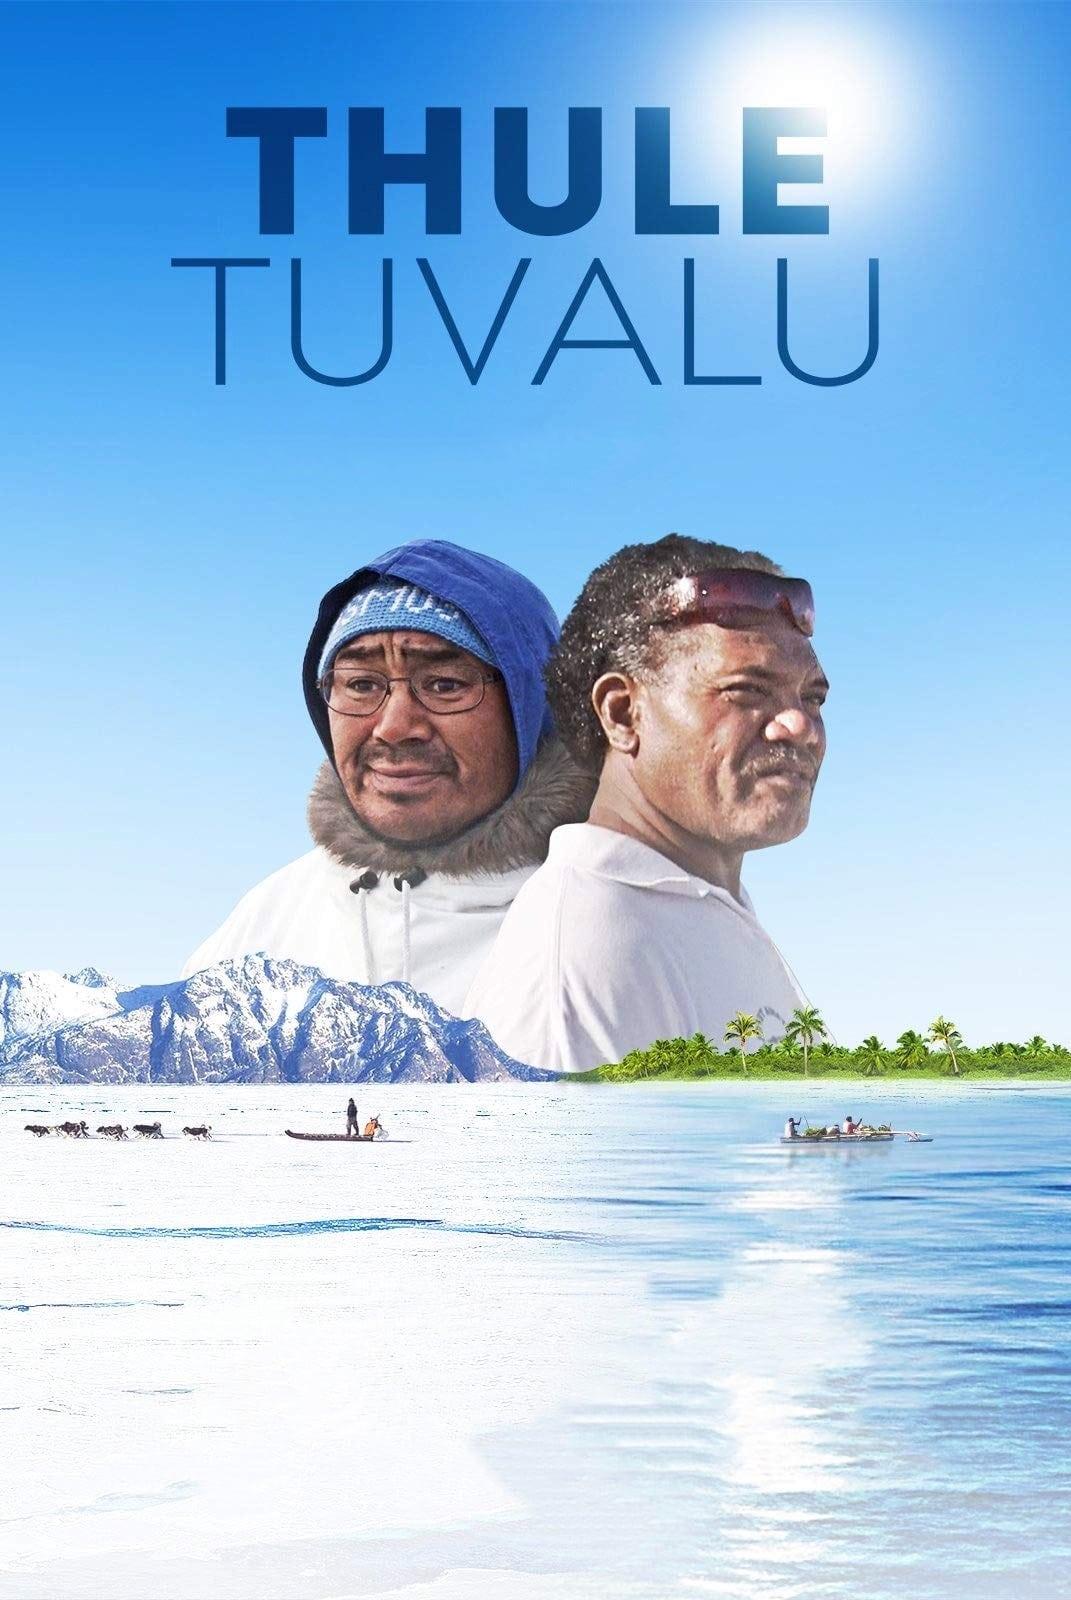 ThuleTuvalu